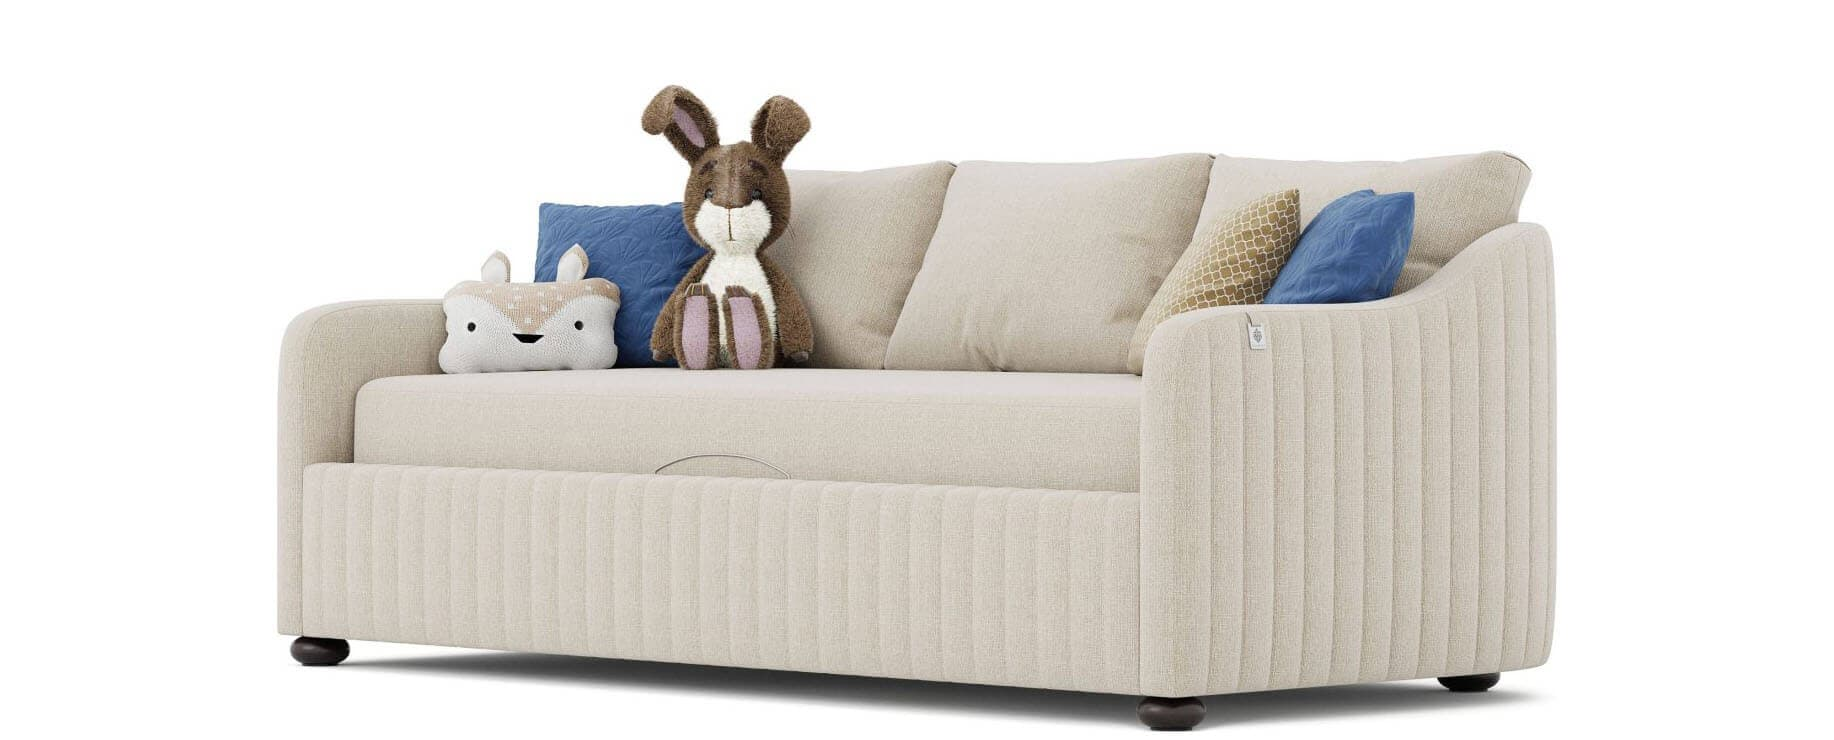 Sofa Bed For Children Kd75 Plus Buy In Kiyv Ukraine From The Manufacturer Delavega